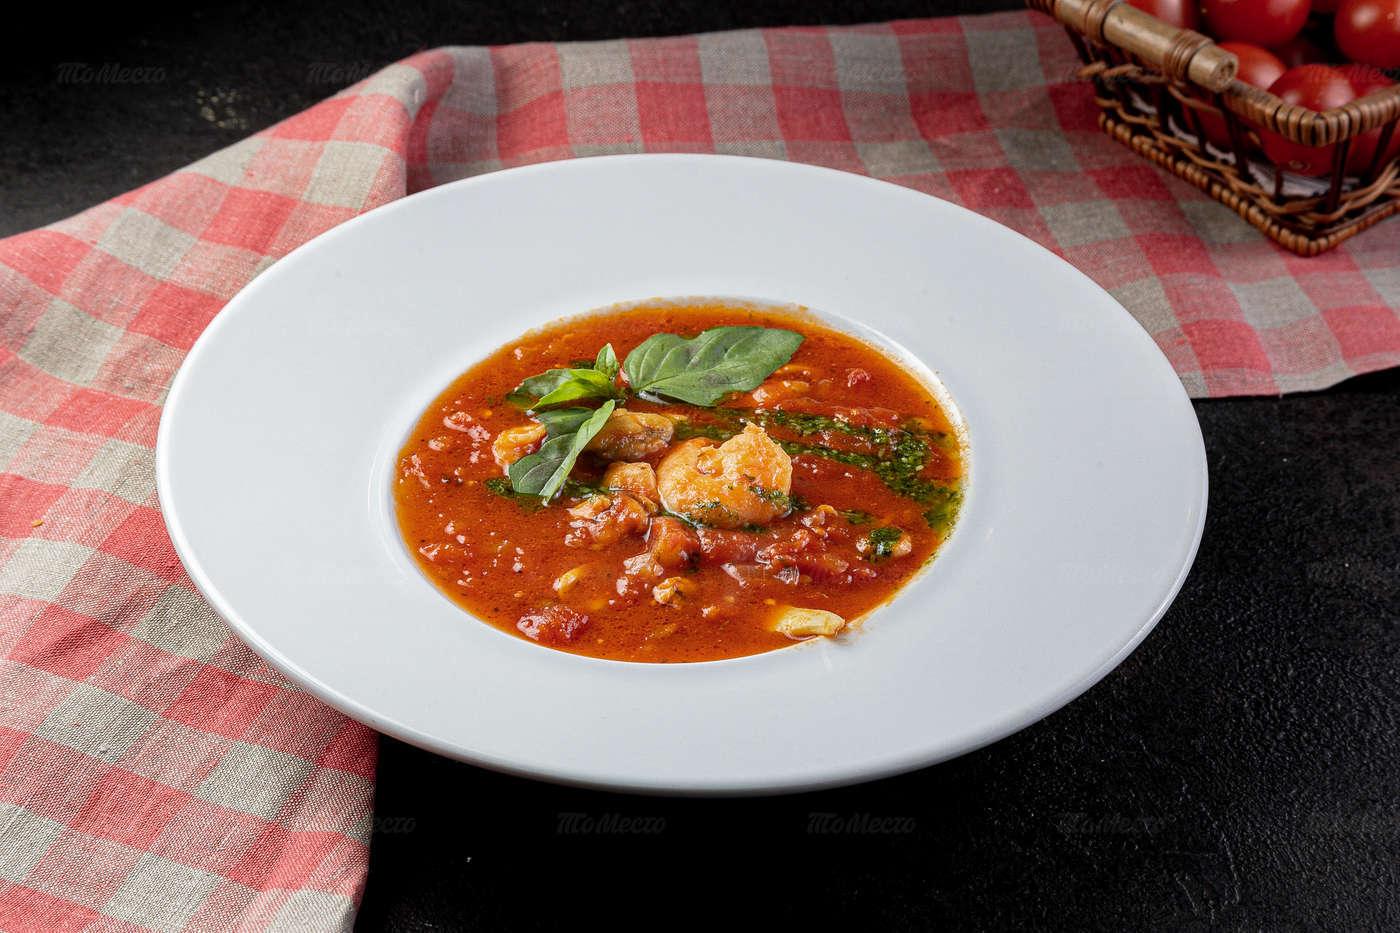 Меню ресторана Папа Пицциано (Papa Pizziano) на Новочеркасском проспекте фото 52